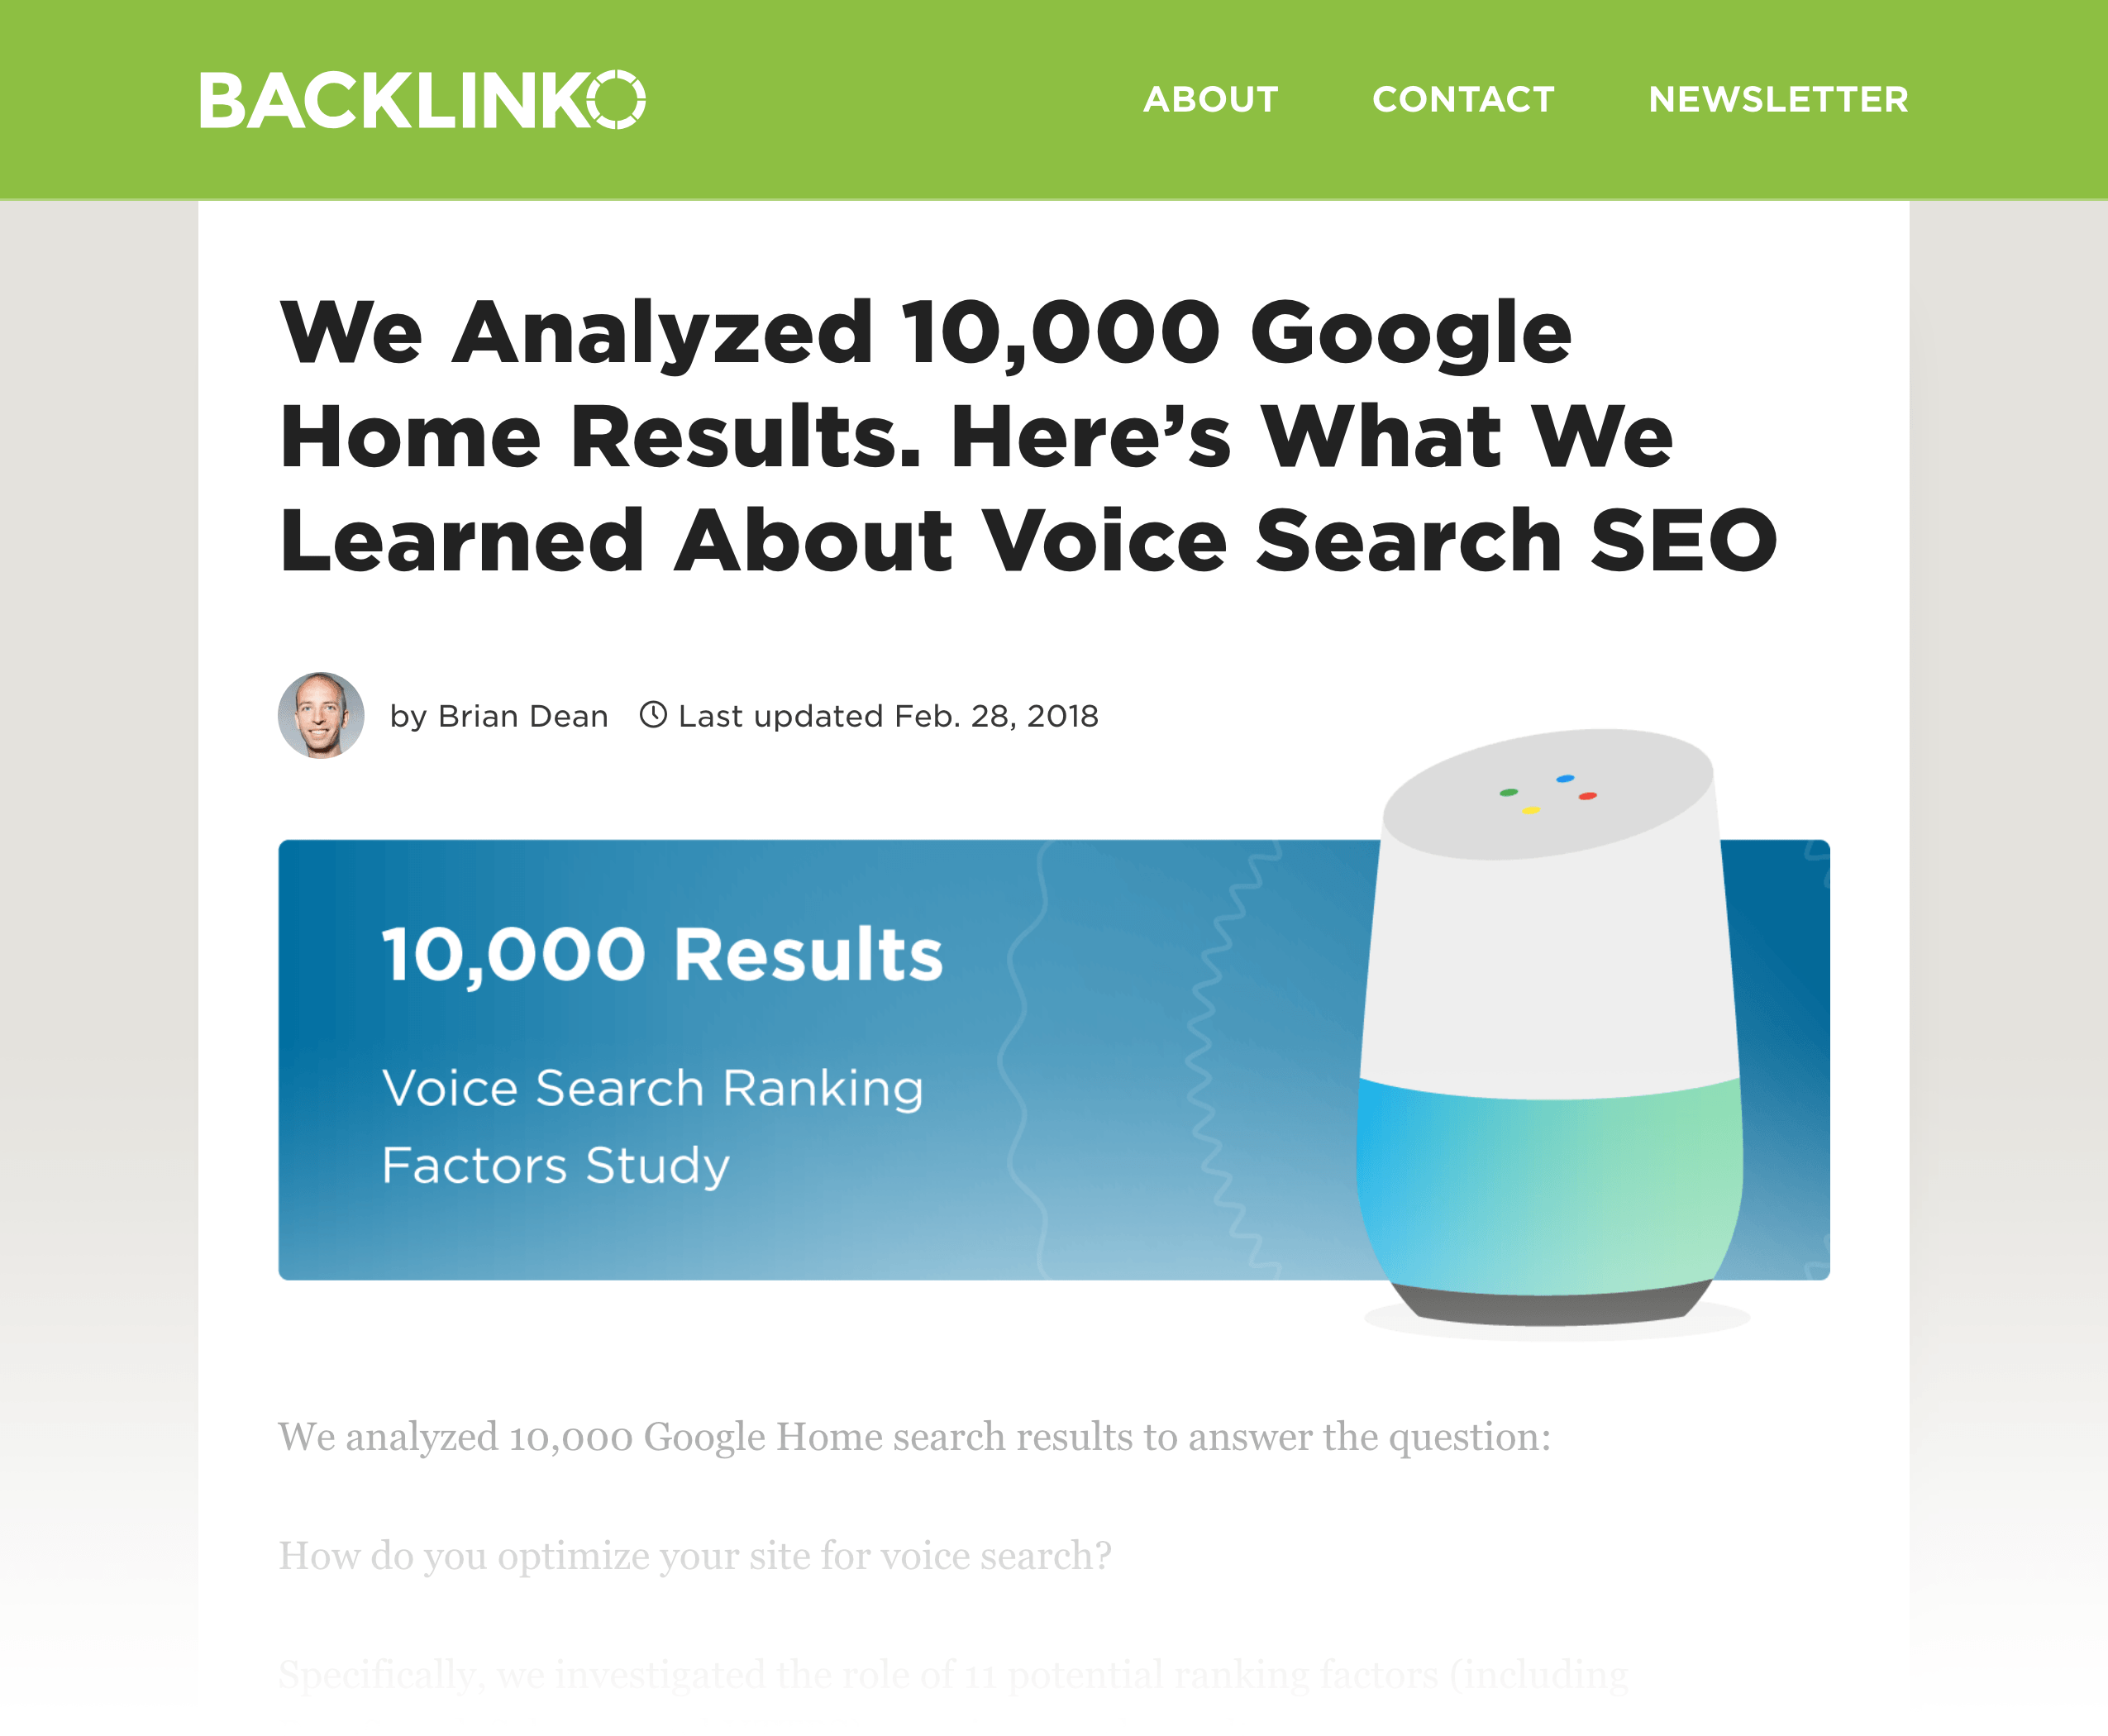 Voice Search Ranking Factors